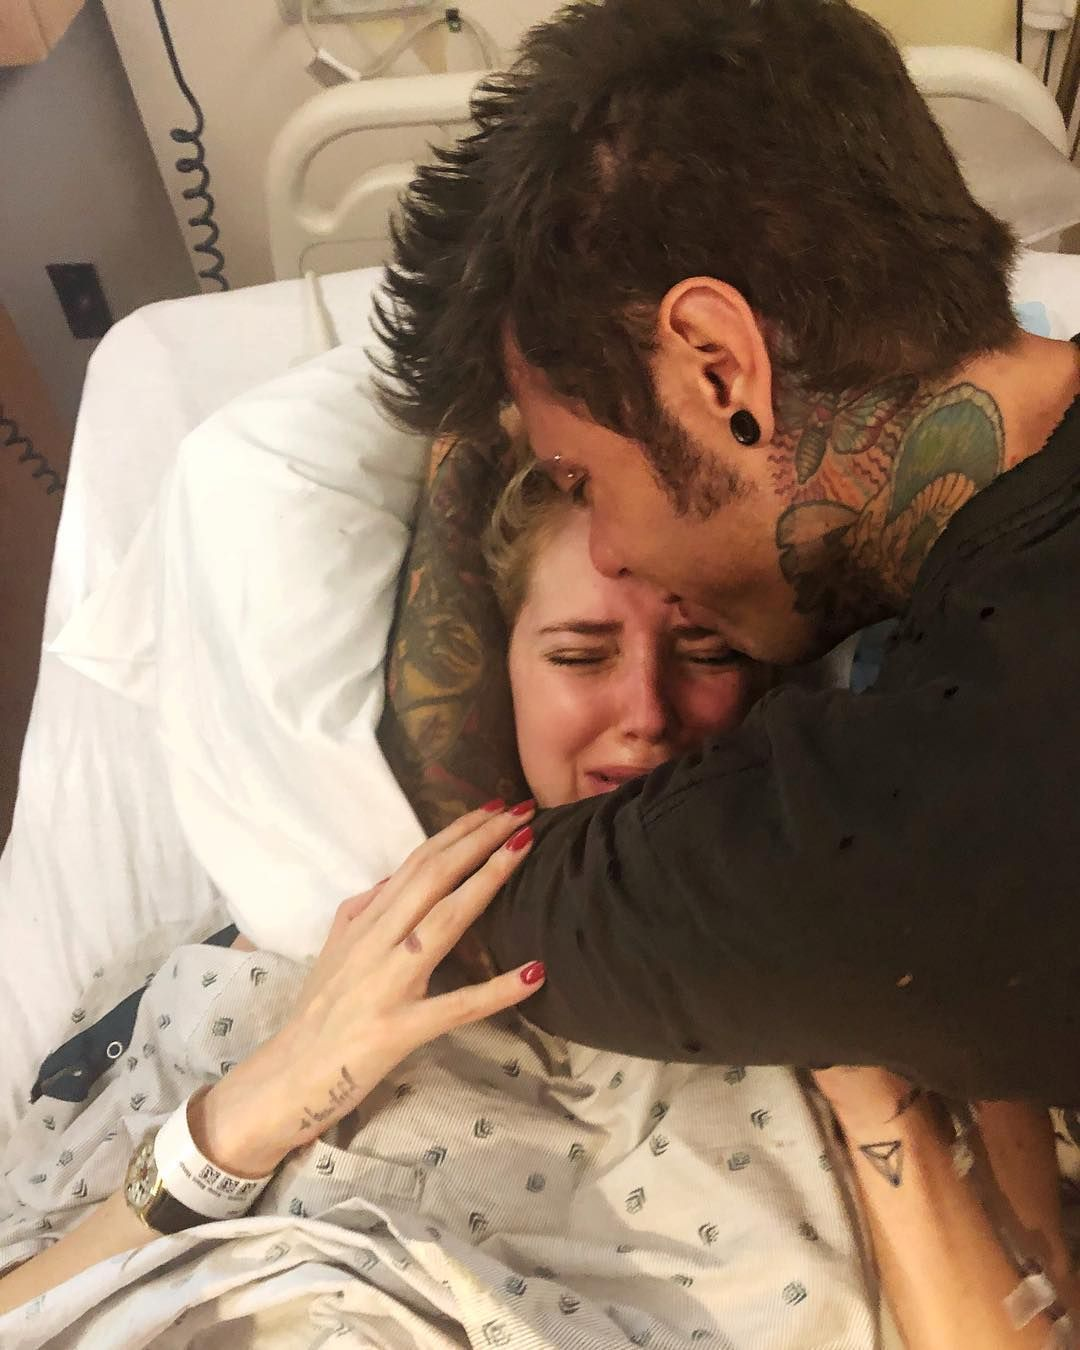 2 3m Likes 28 2k Comments Chiara Ferragni Chiaraferragni On Instagram These Were The Best Tears I Ve Ev Couples Cute Couples Goals Cute Couple Pictures